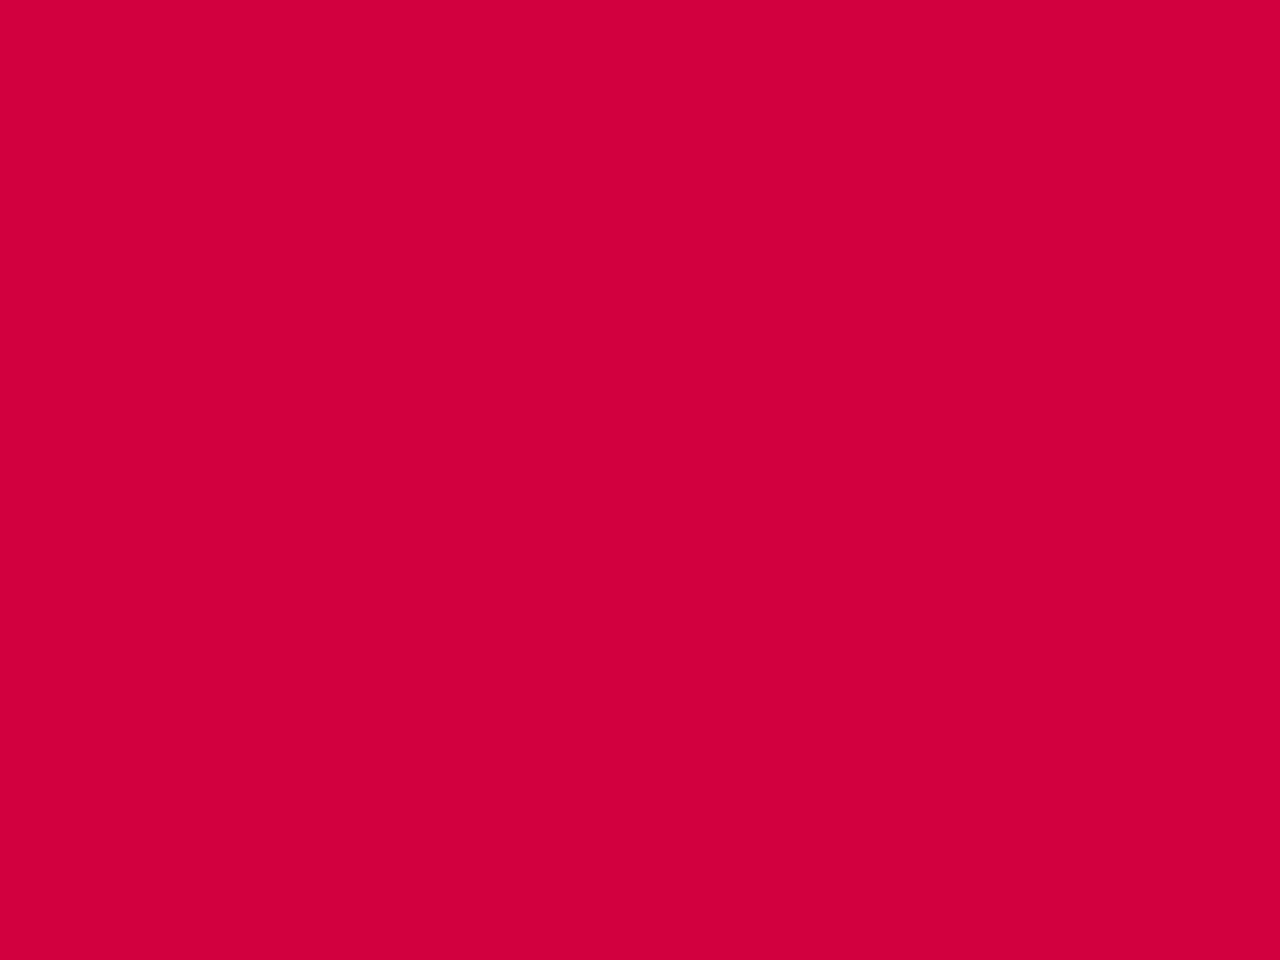 1280x960 Utah Crimson Solid Color Background